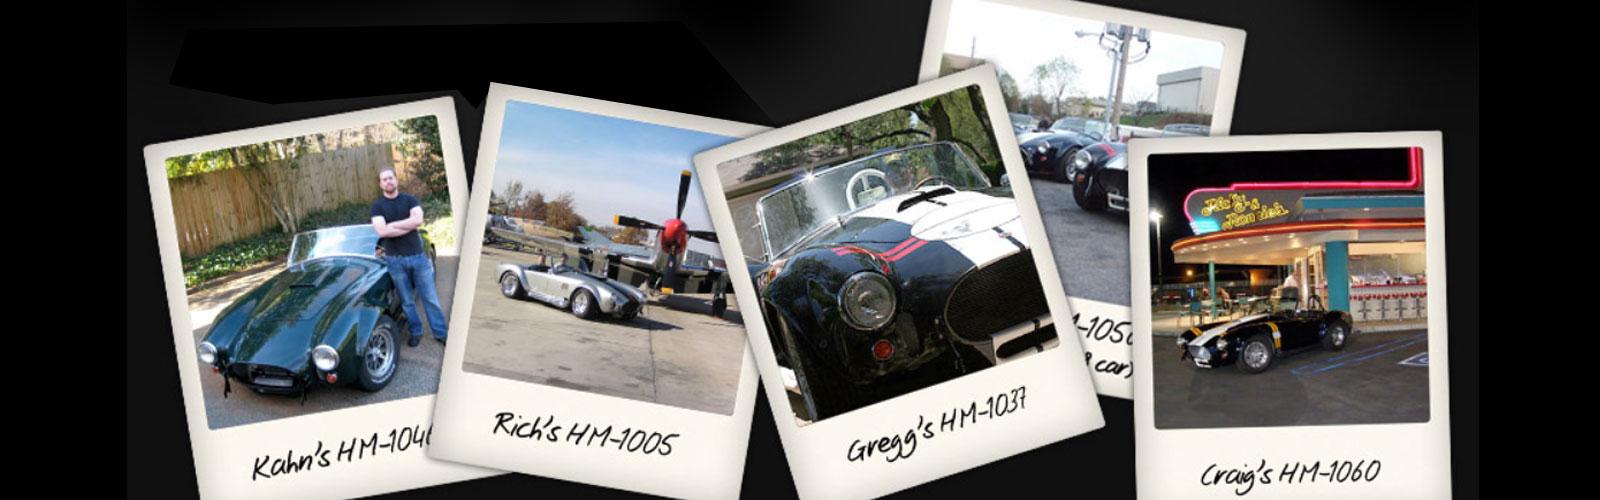 Hurricane Motorsports Owners